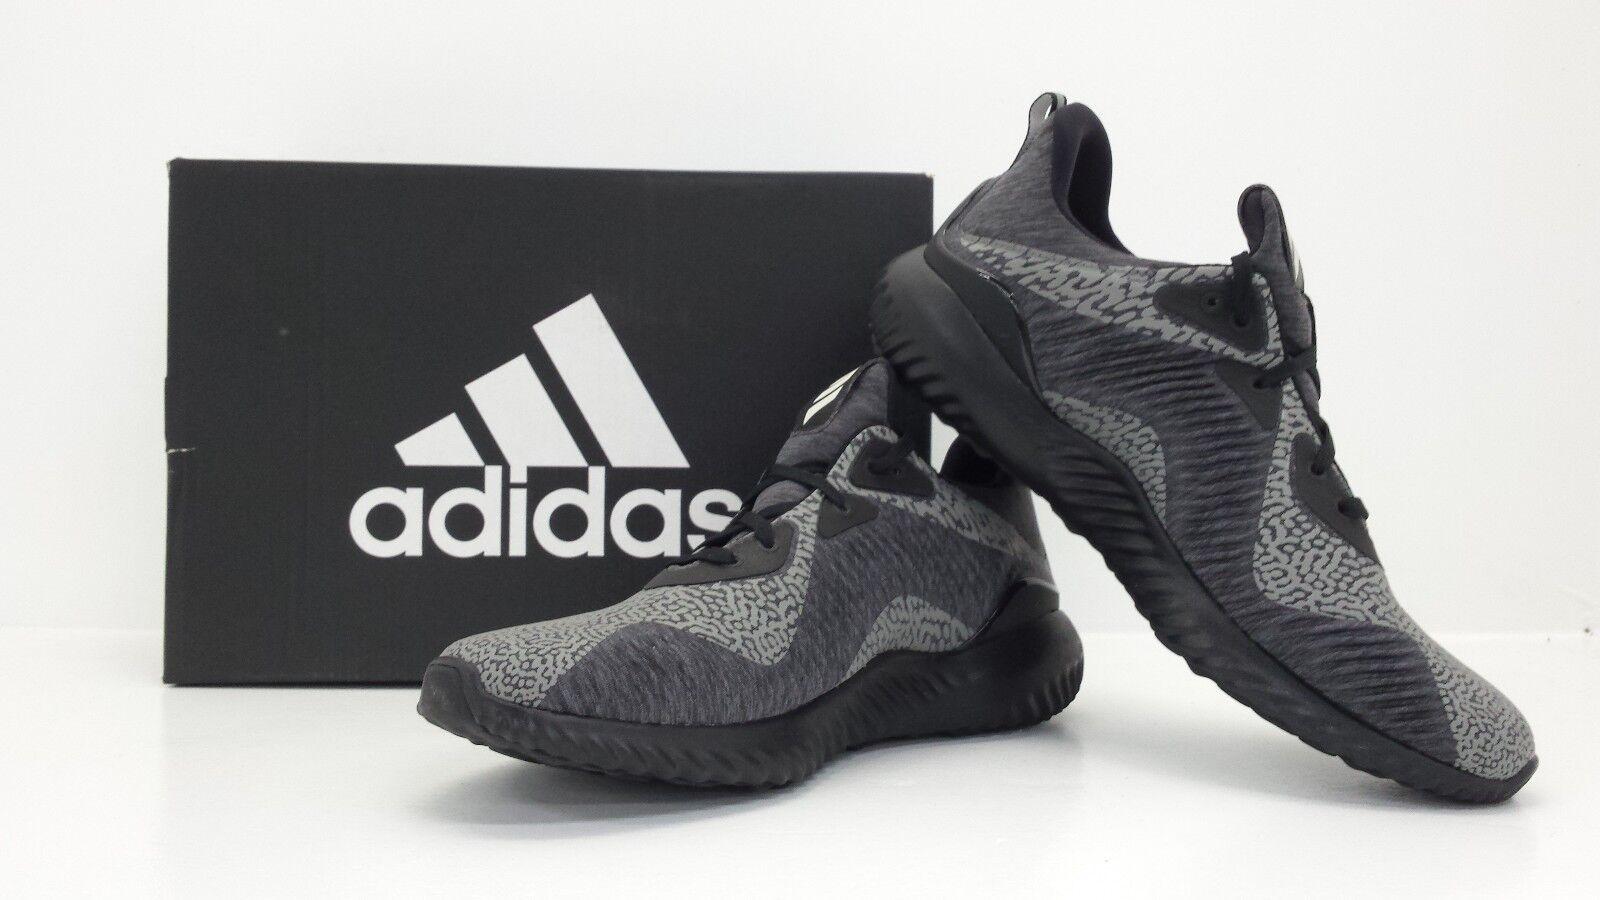 adidas schwarz alphabounce hpc ams kern schwarz adidas / schwarz / schwarz da9561 - brand new in box!! 61c2be